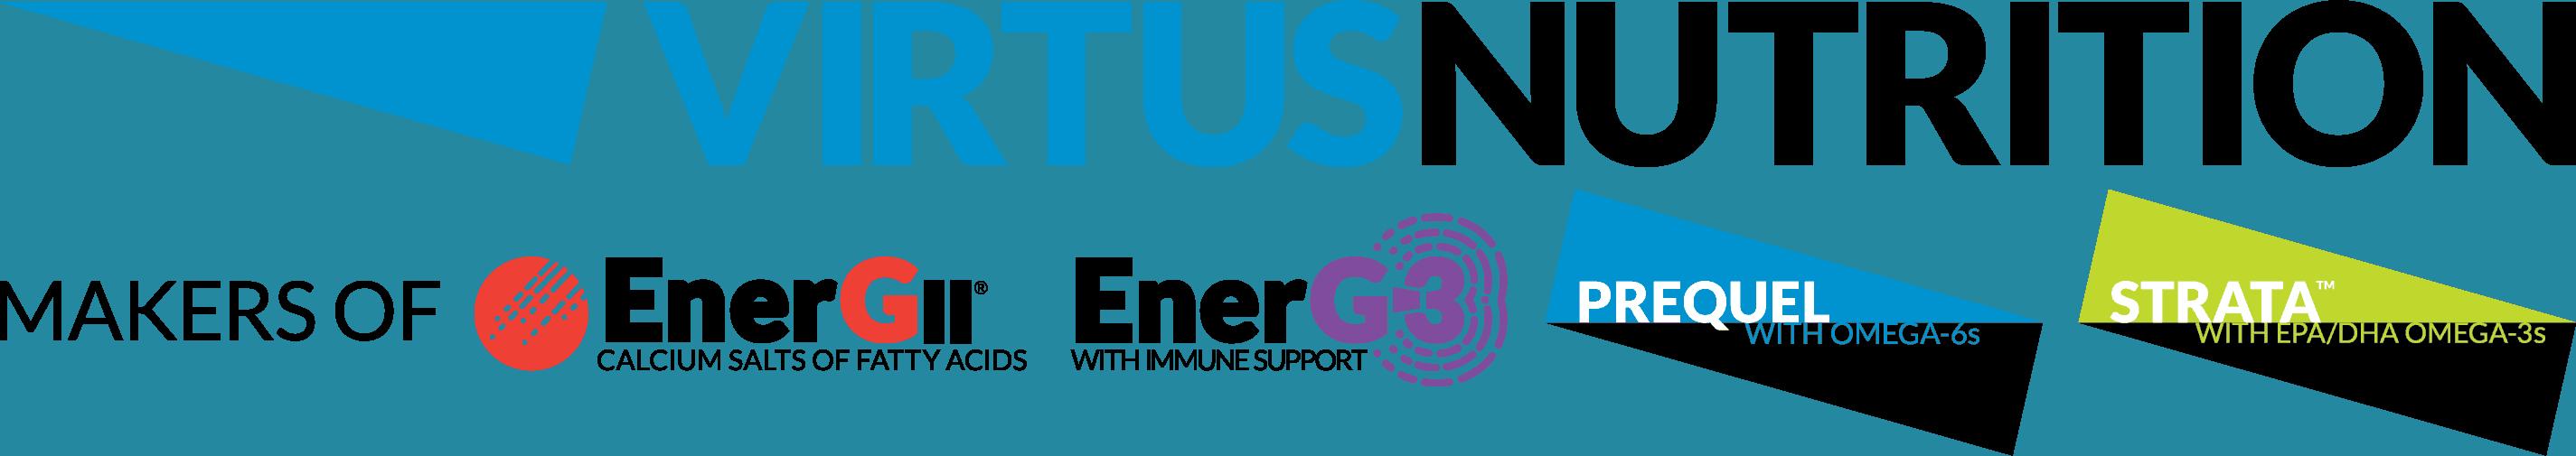 Virtus Nutrition, makers of EnerGII, Prequel